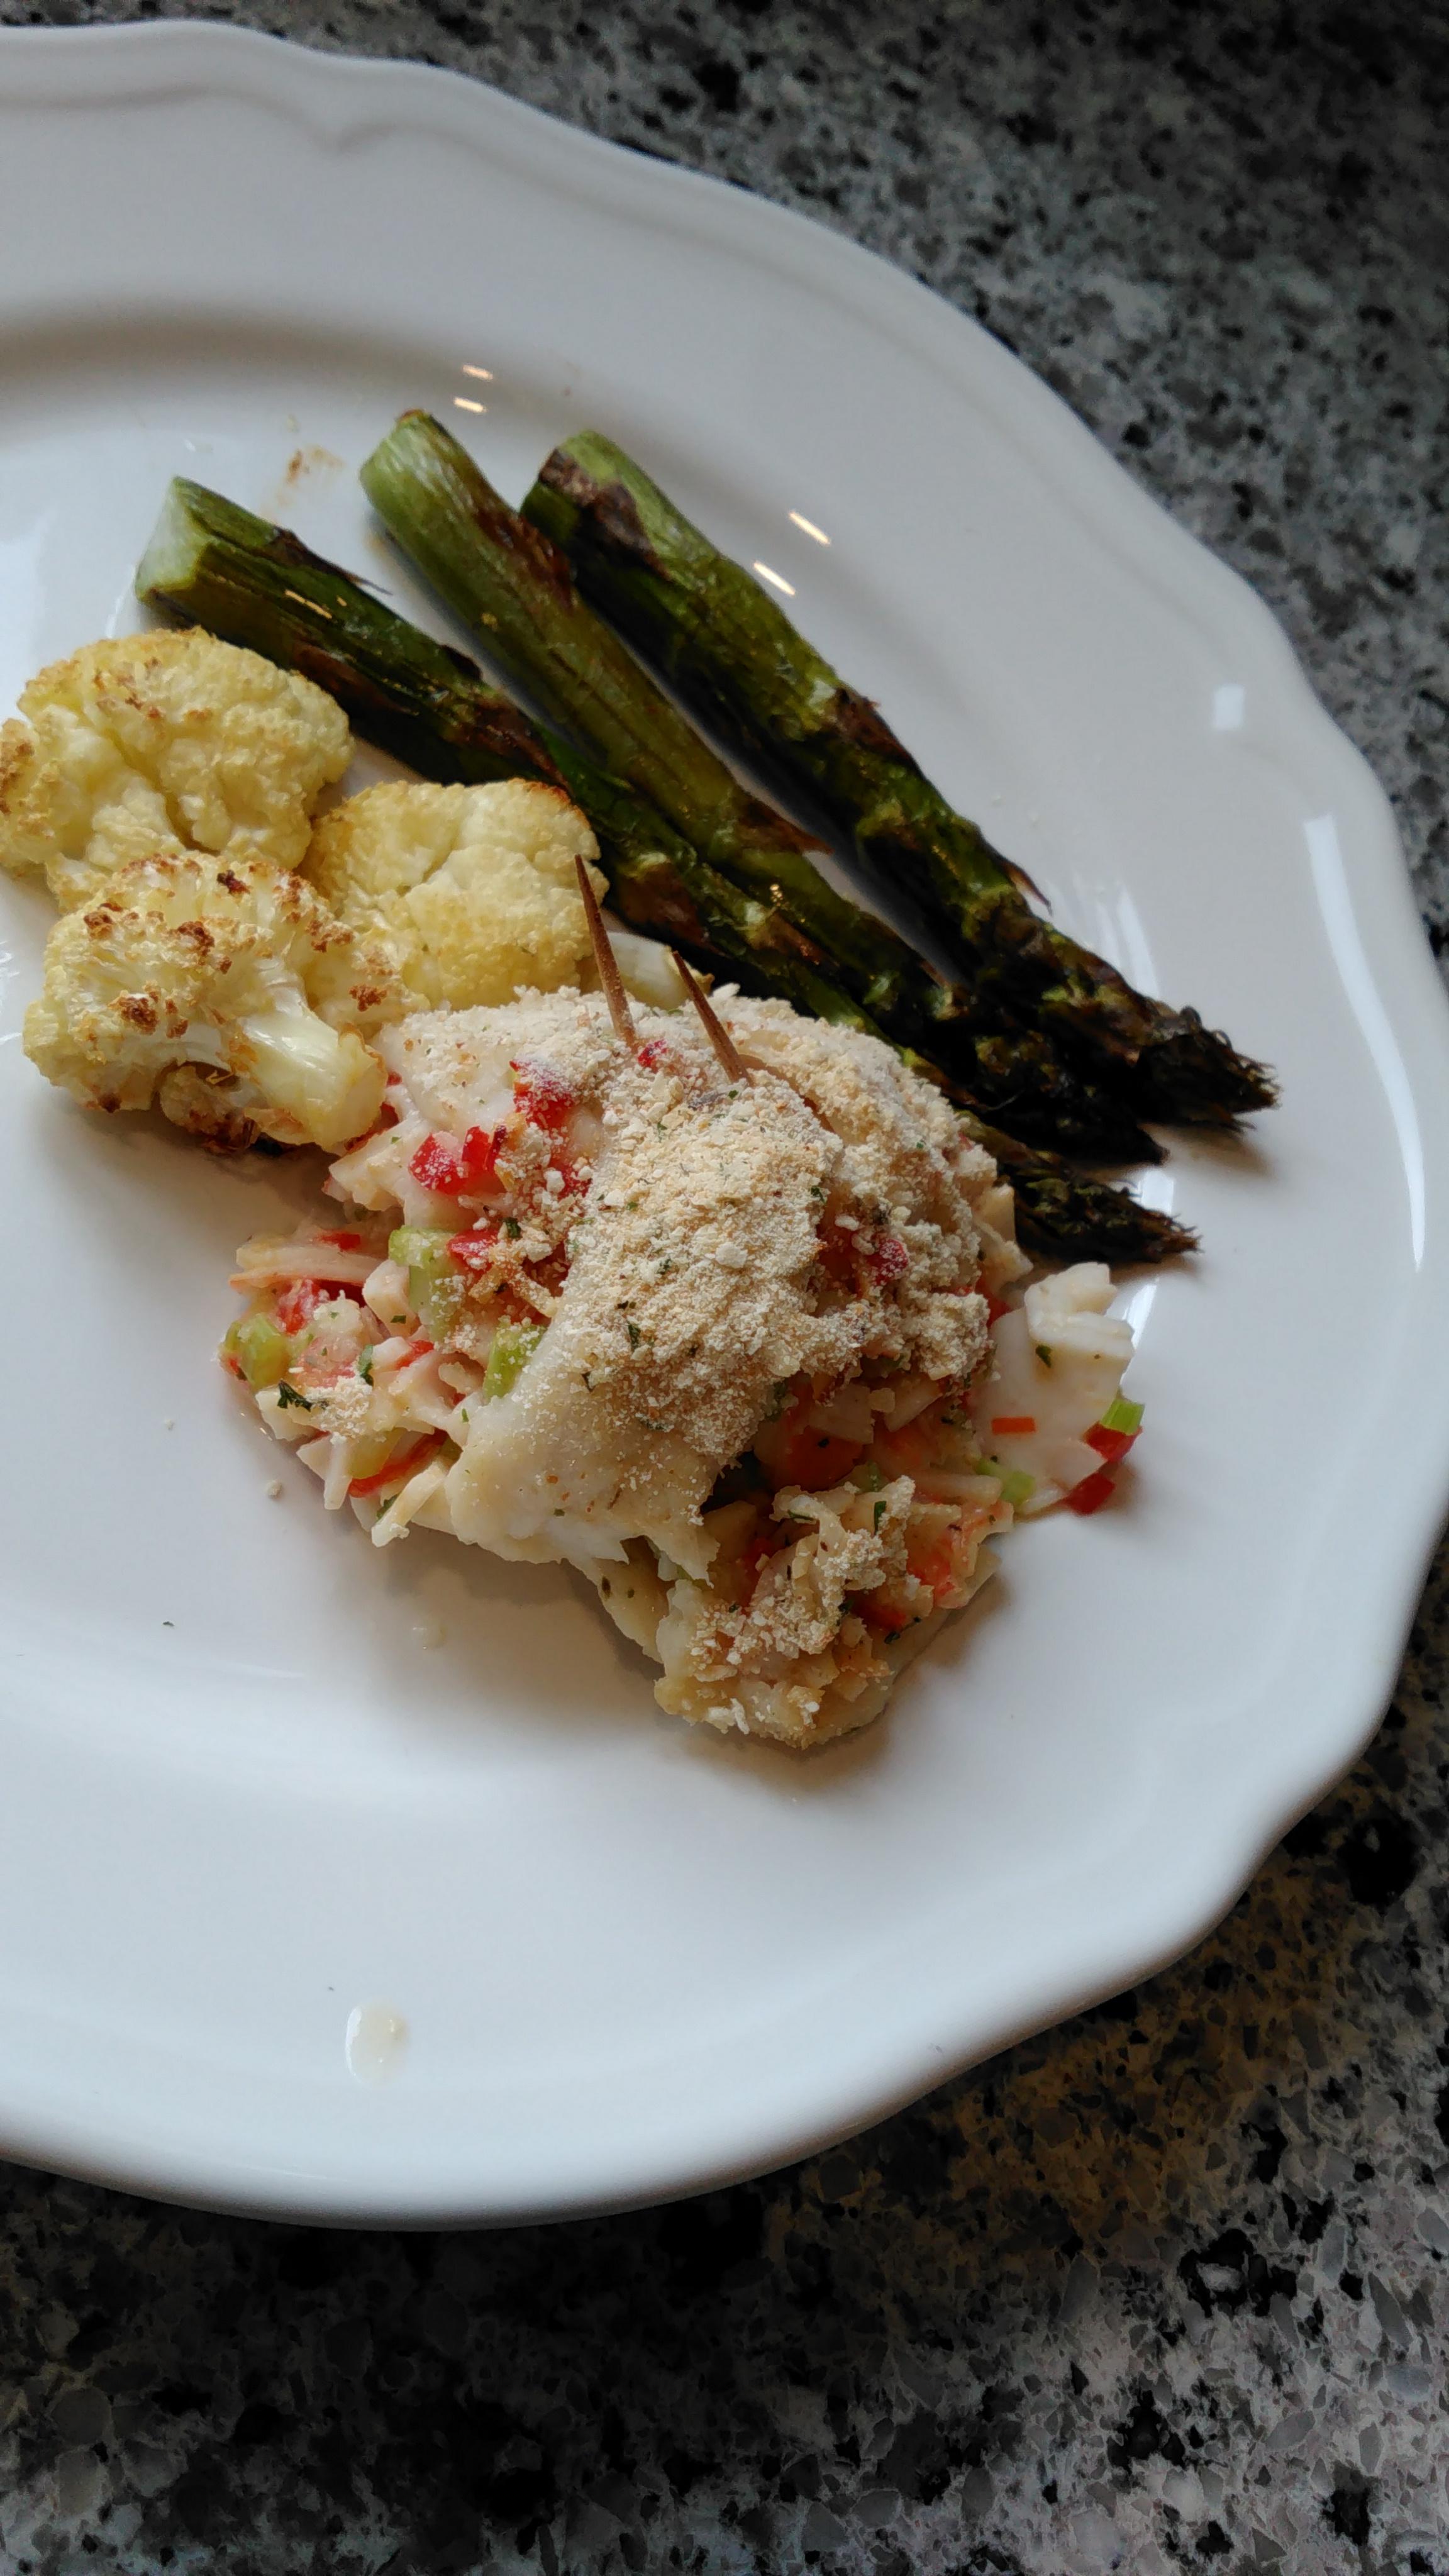 Stuffed Sole with Imitation Crab